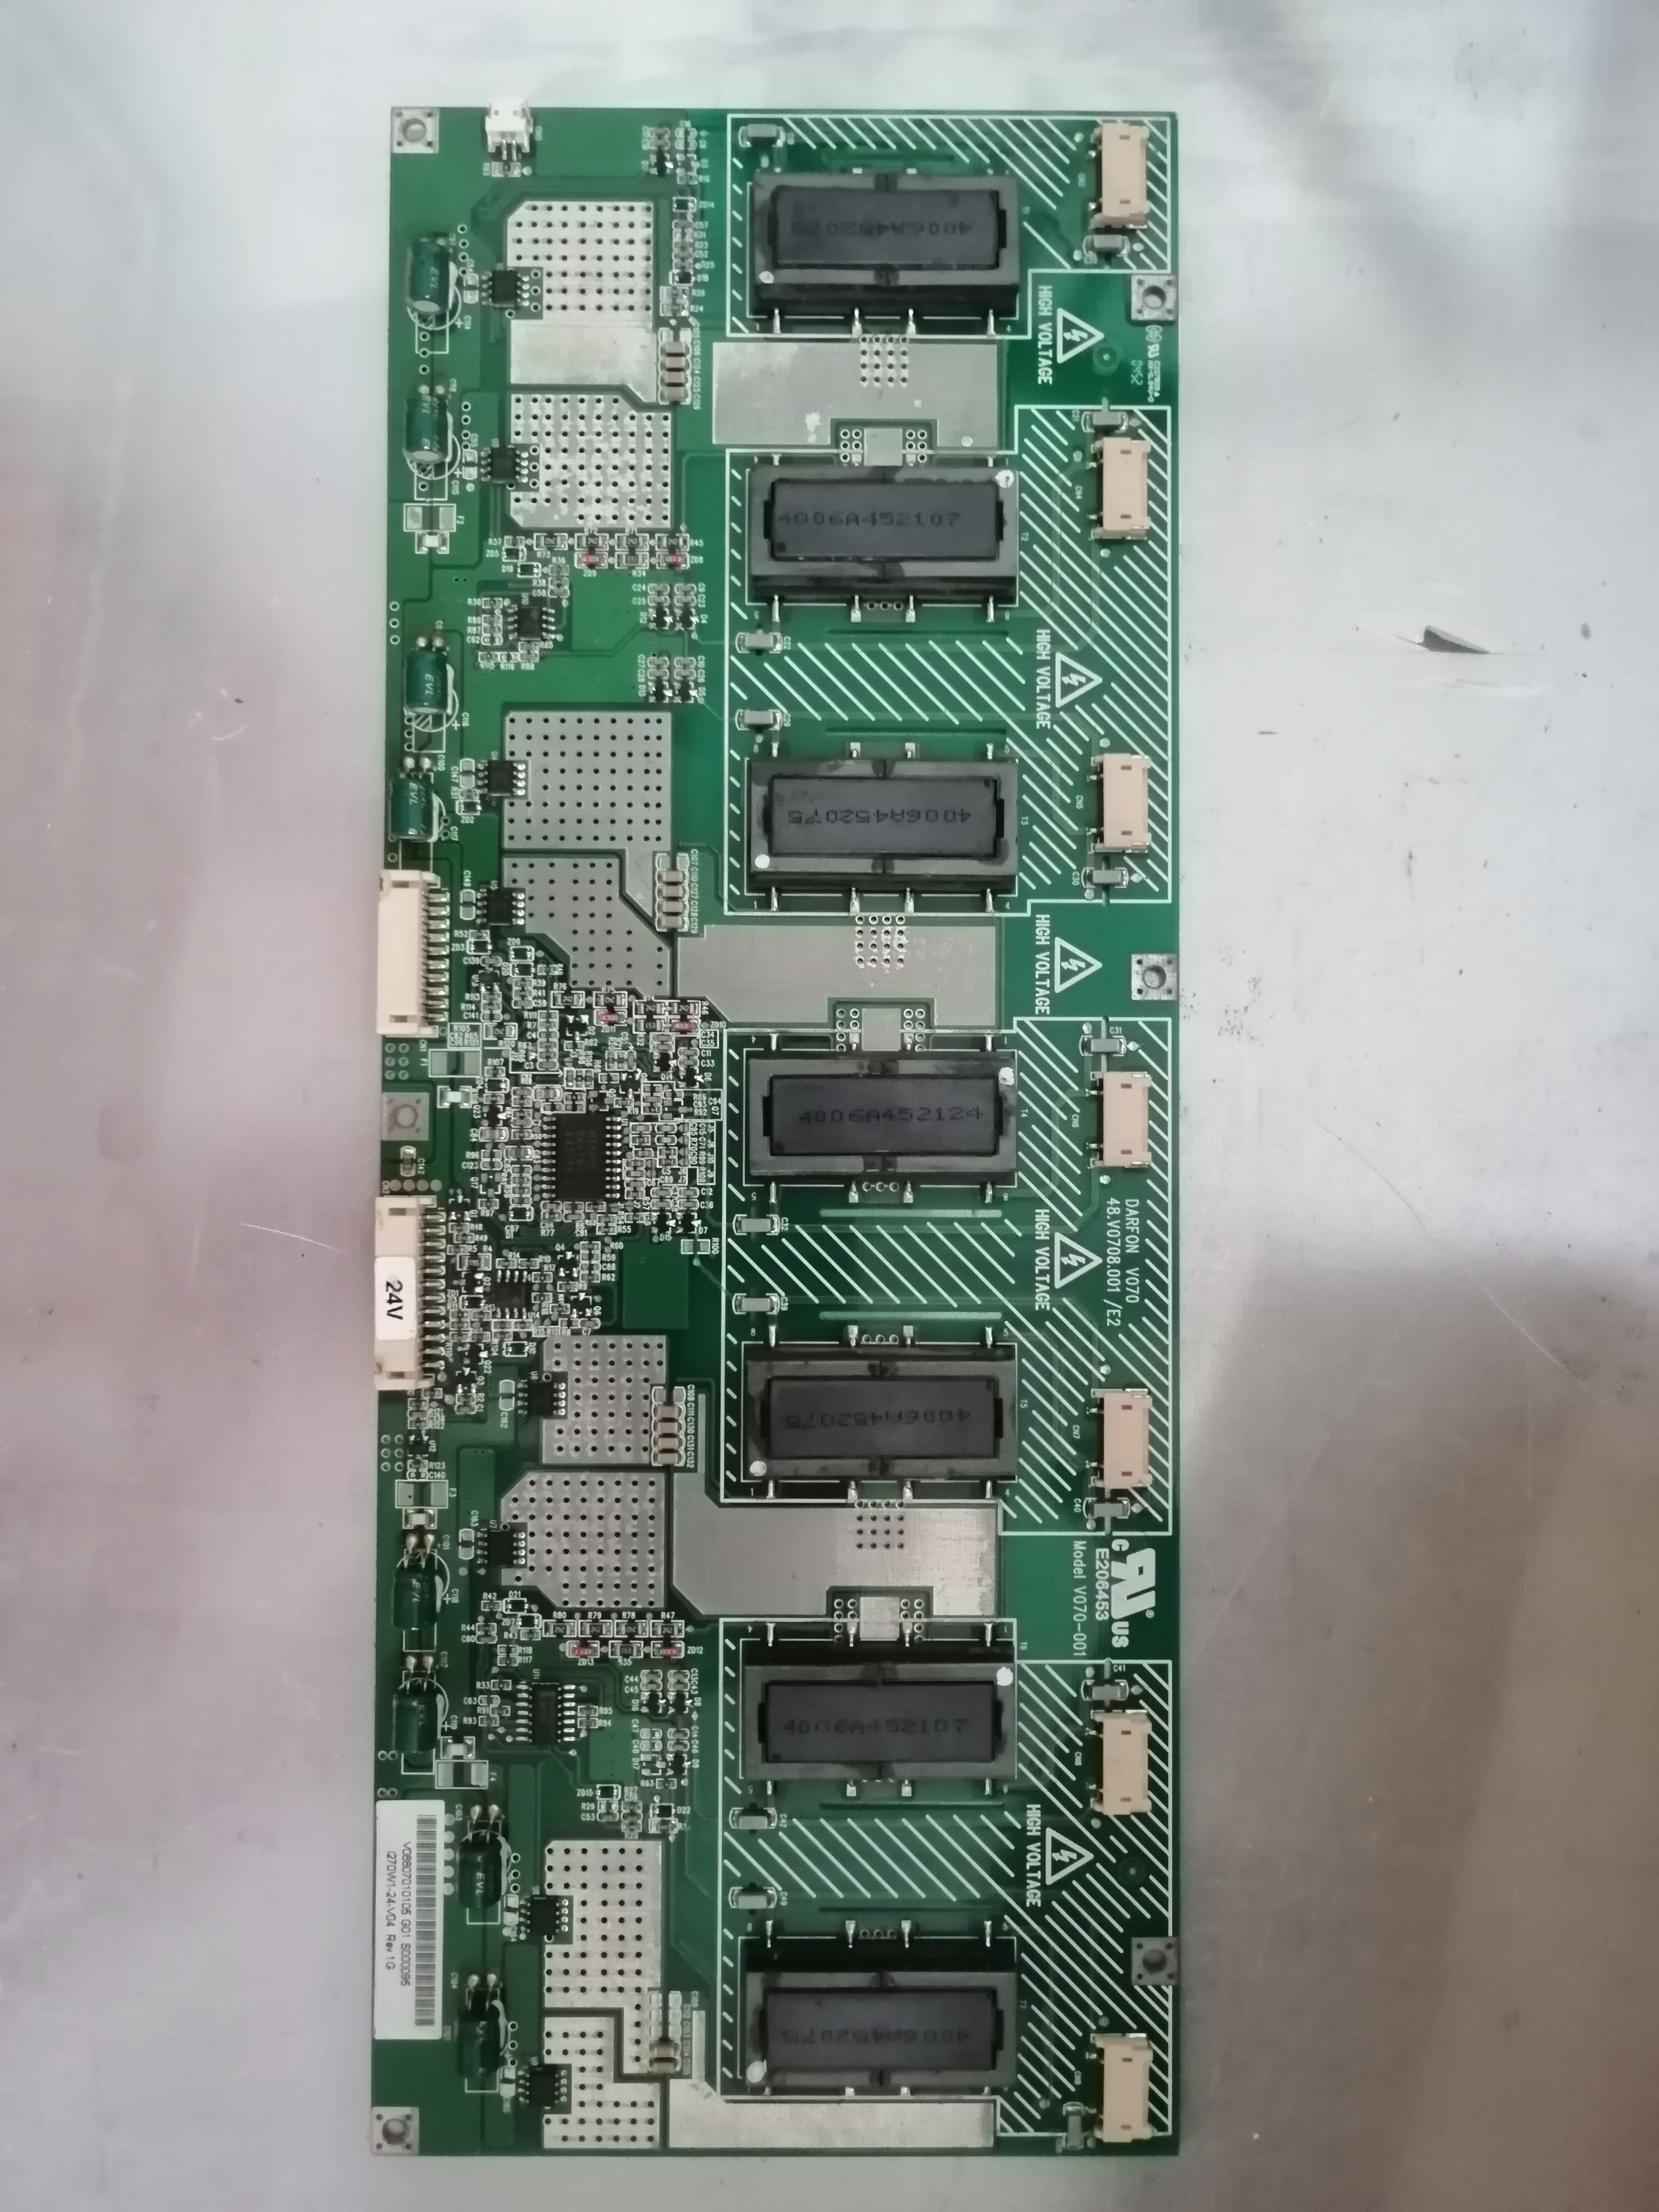 4H V0708 001 E5 48 V0708 001 E2 V070-001 high voltage Logic board for connect with  T-CON connect board